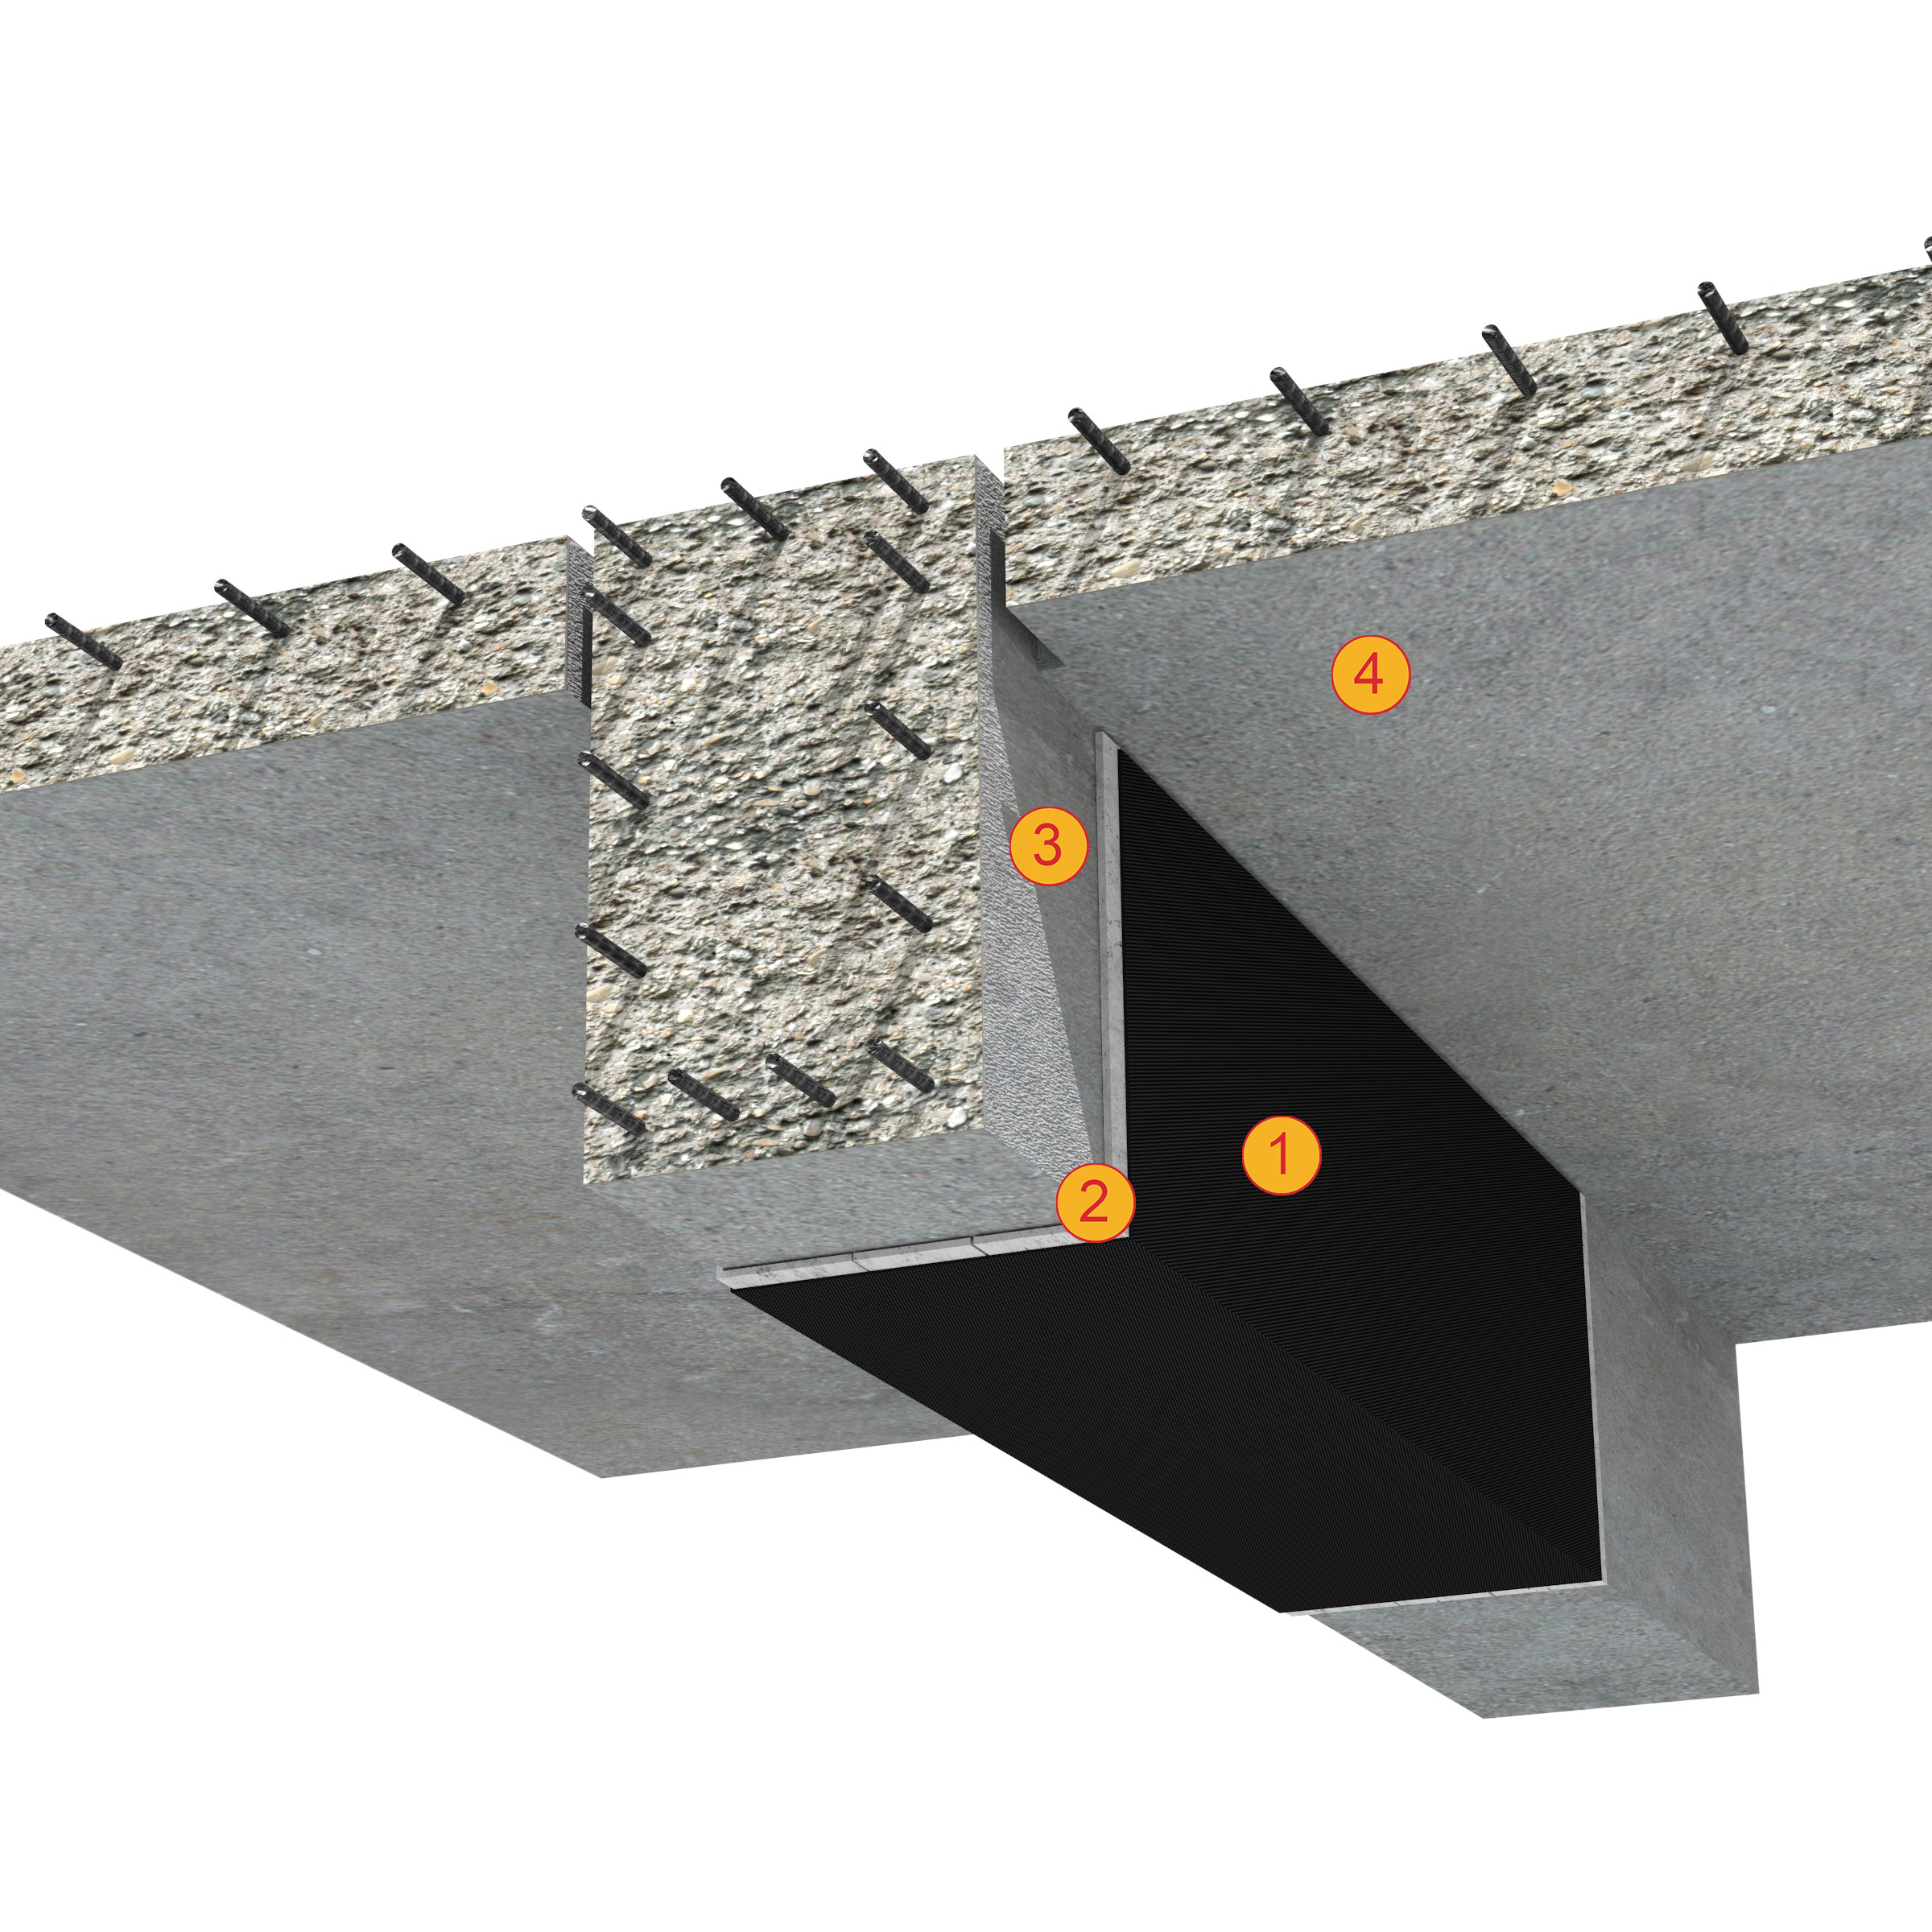 SikaWrap - detaliu de aplicare tesatura din fibre de carbon - Detalii de aplicare SikaCarboDur si